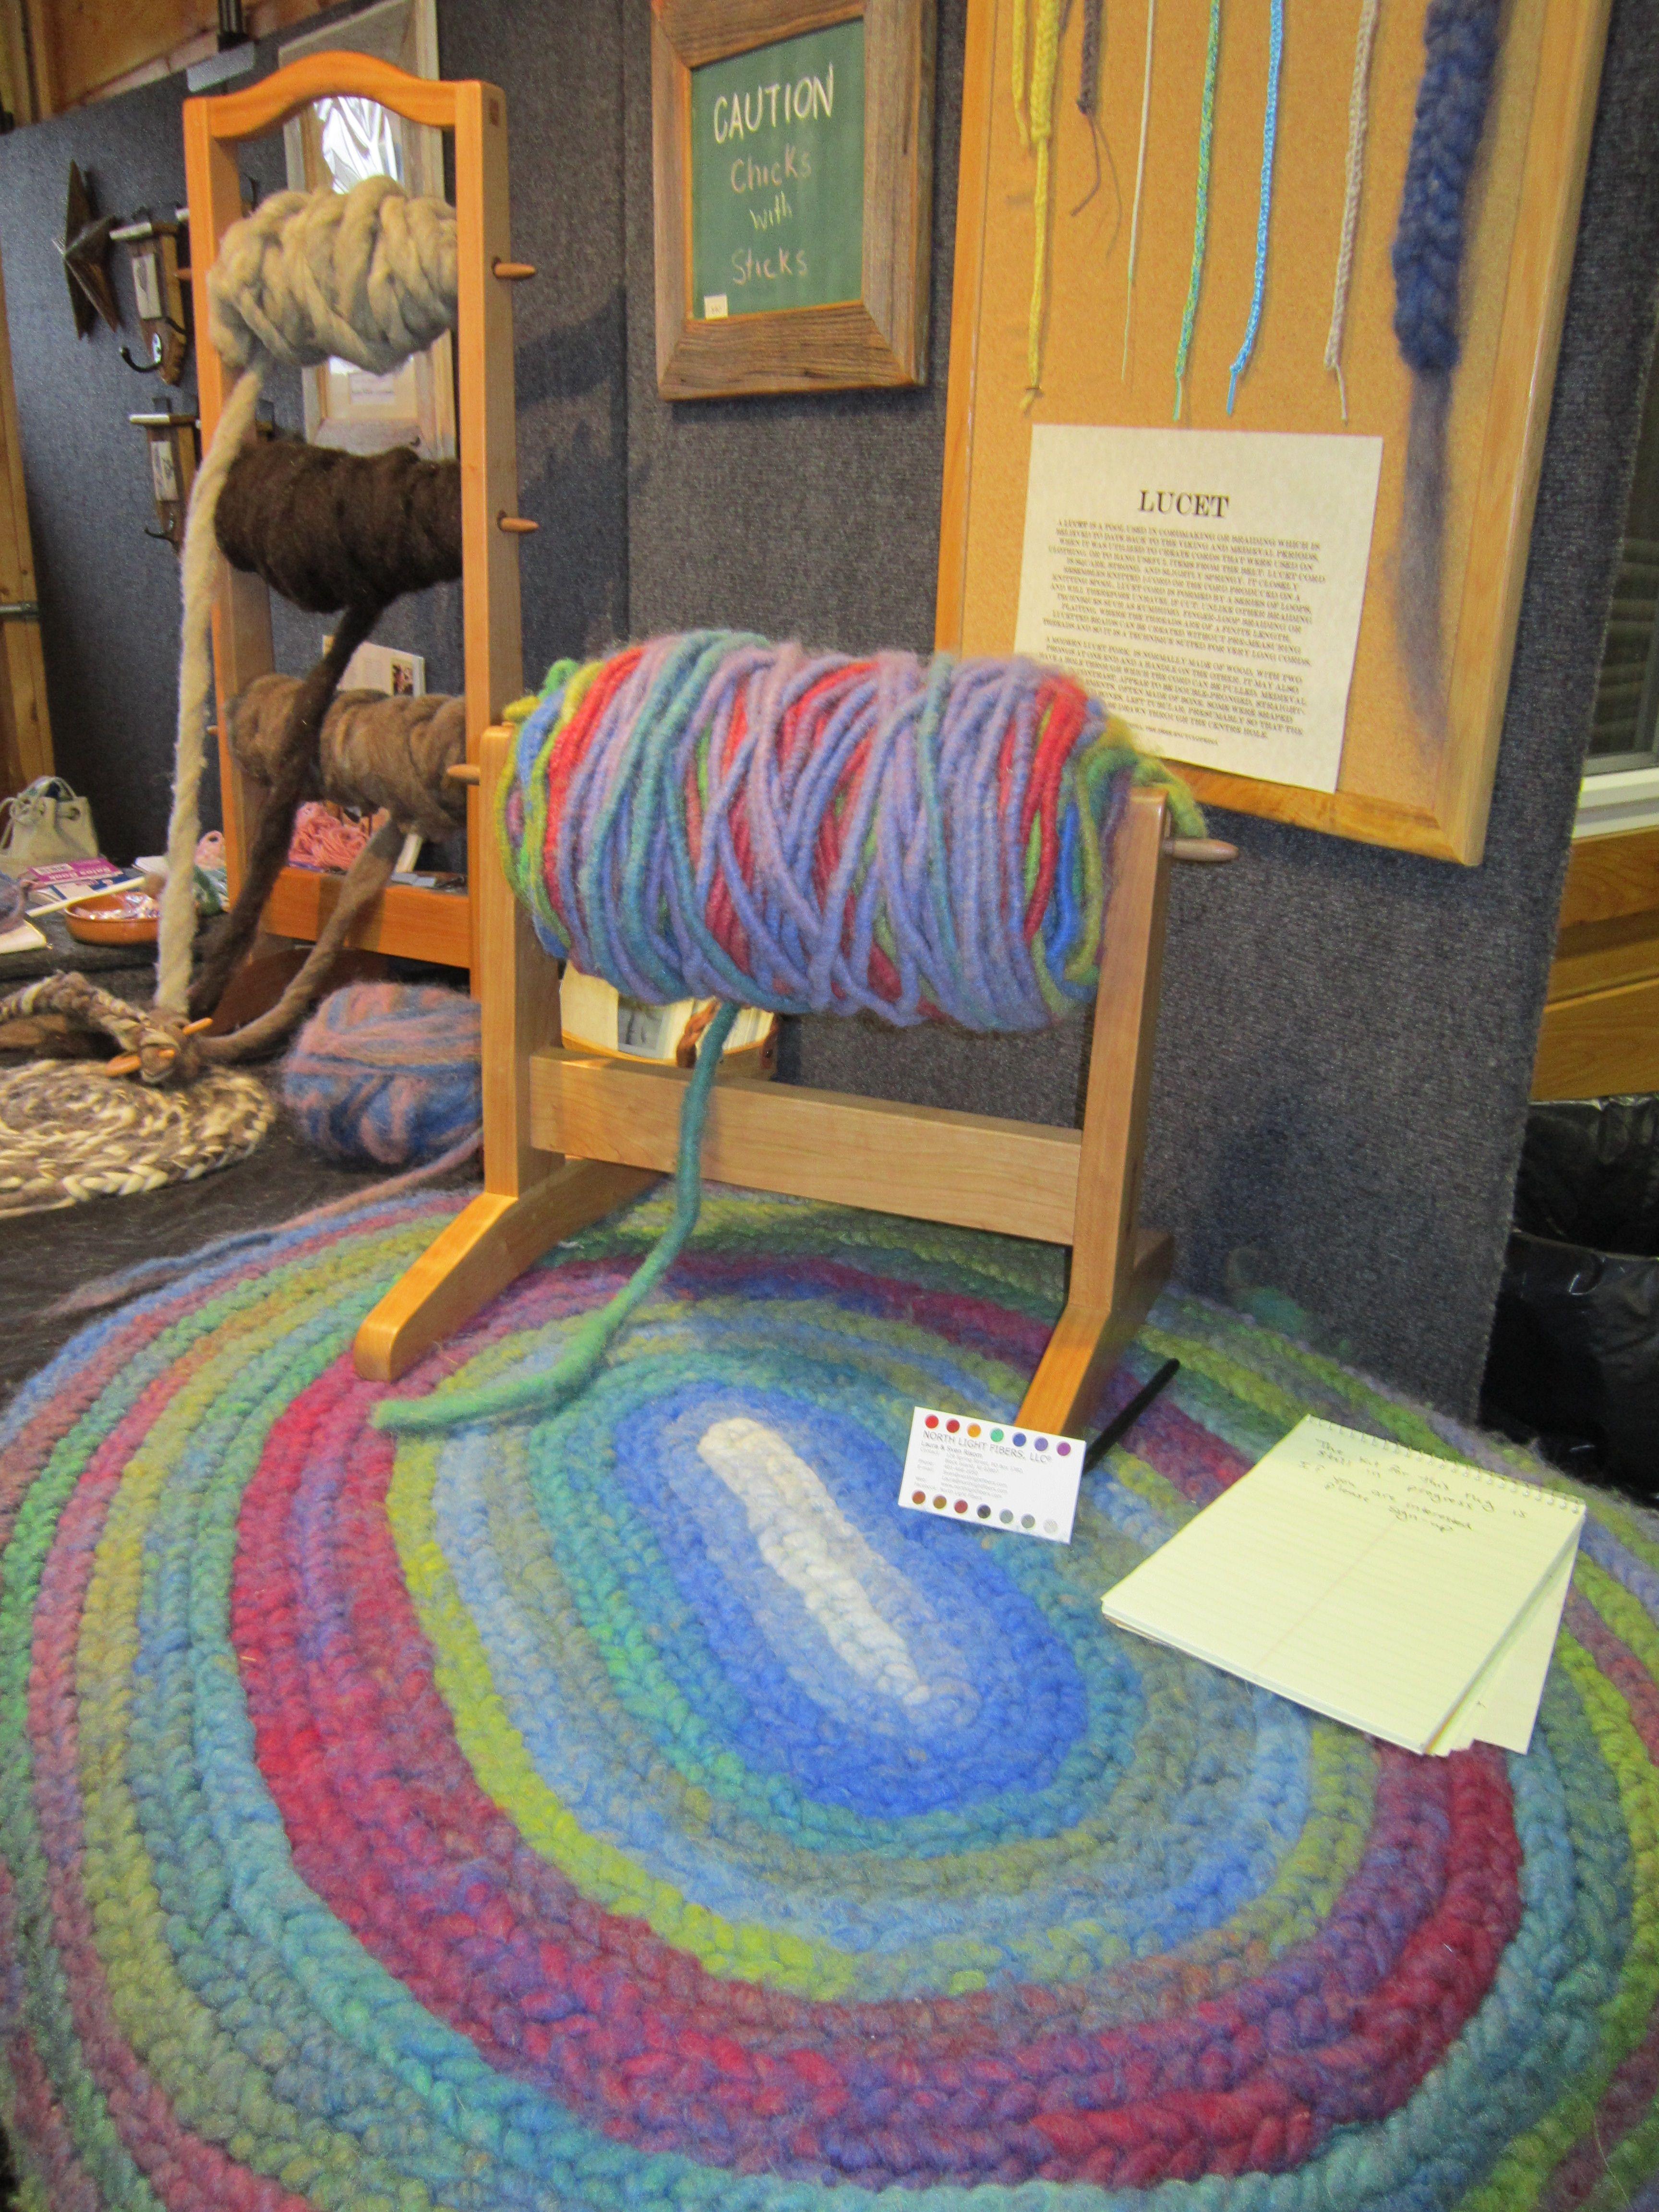 Lucet Rug Made With Rug Yarn And A Bump Holder For The Alpaca Yarn Rug Rug Yarn Yarn Diy Lucet